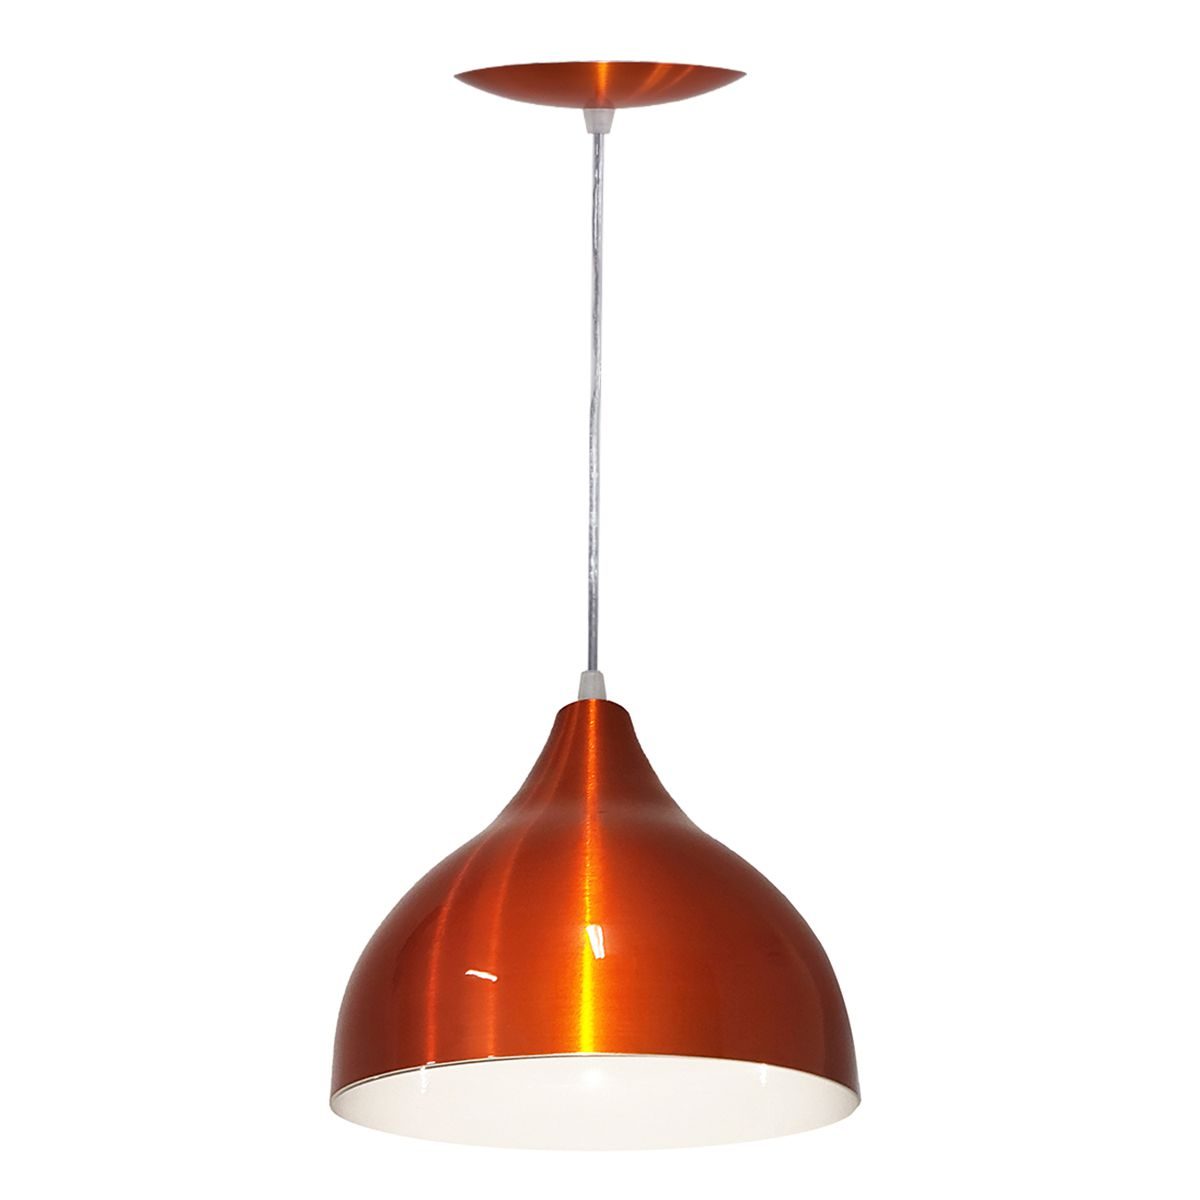 Luminária Decorativa Ártemis Laranja Cobreado com Pendente